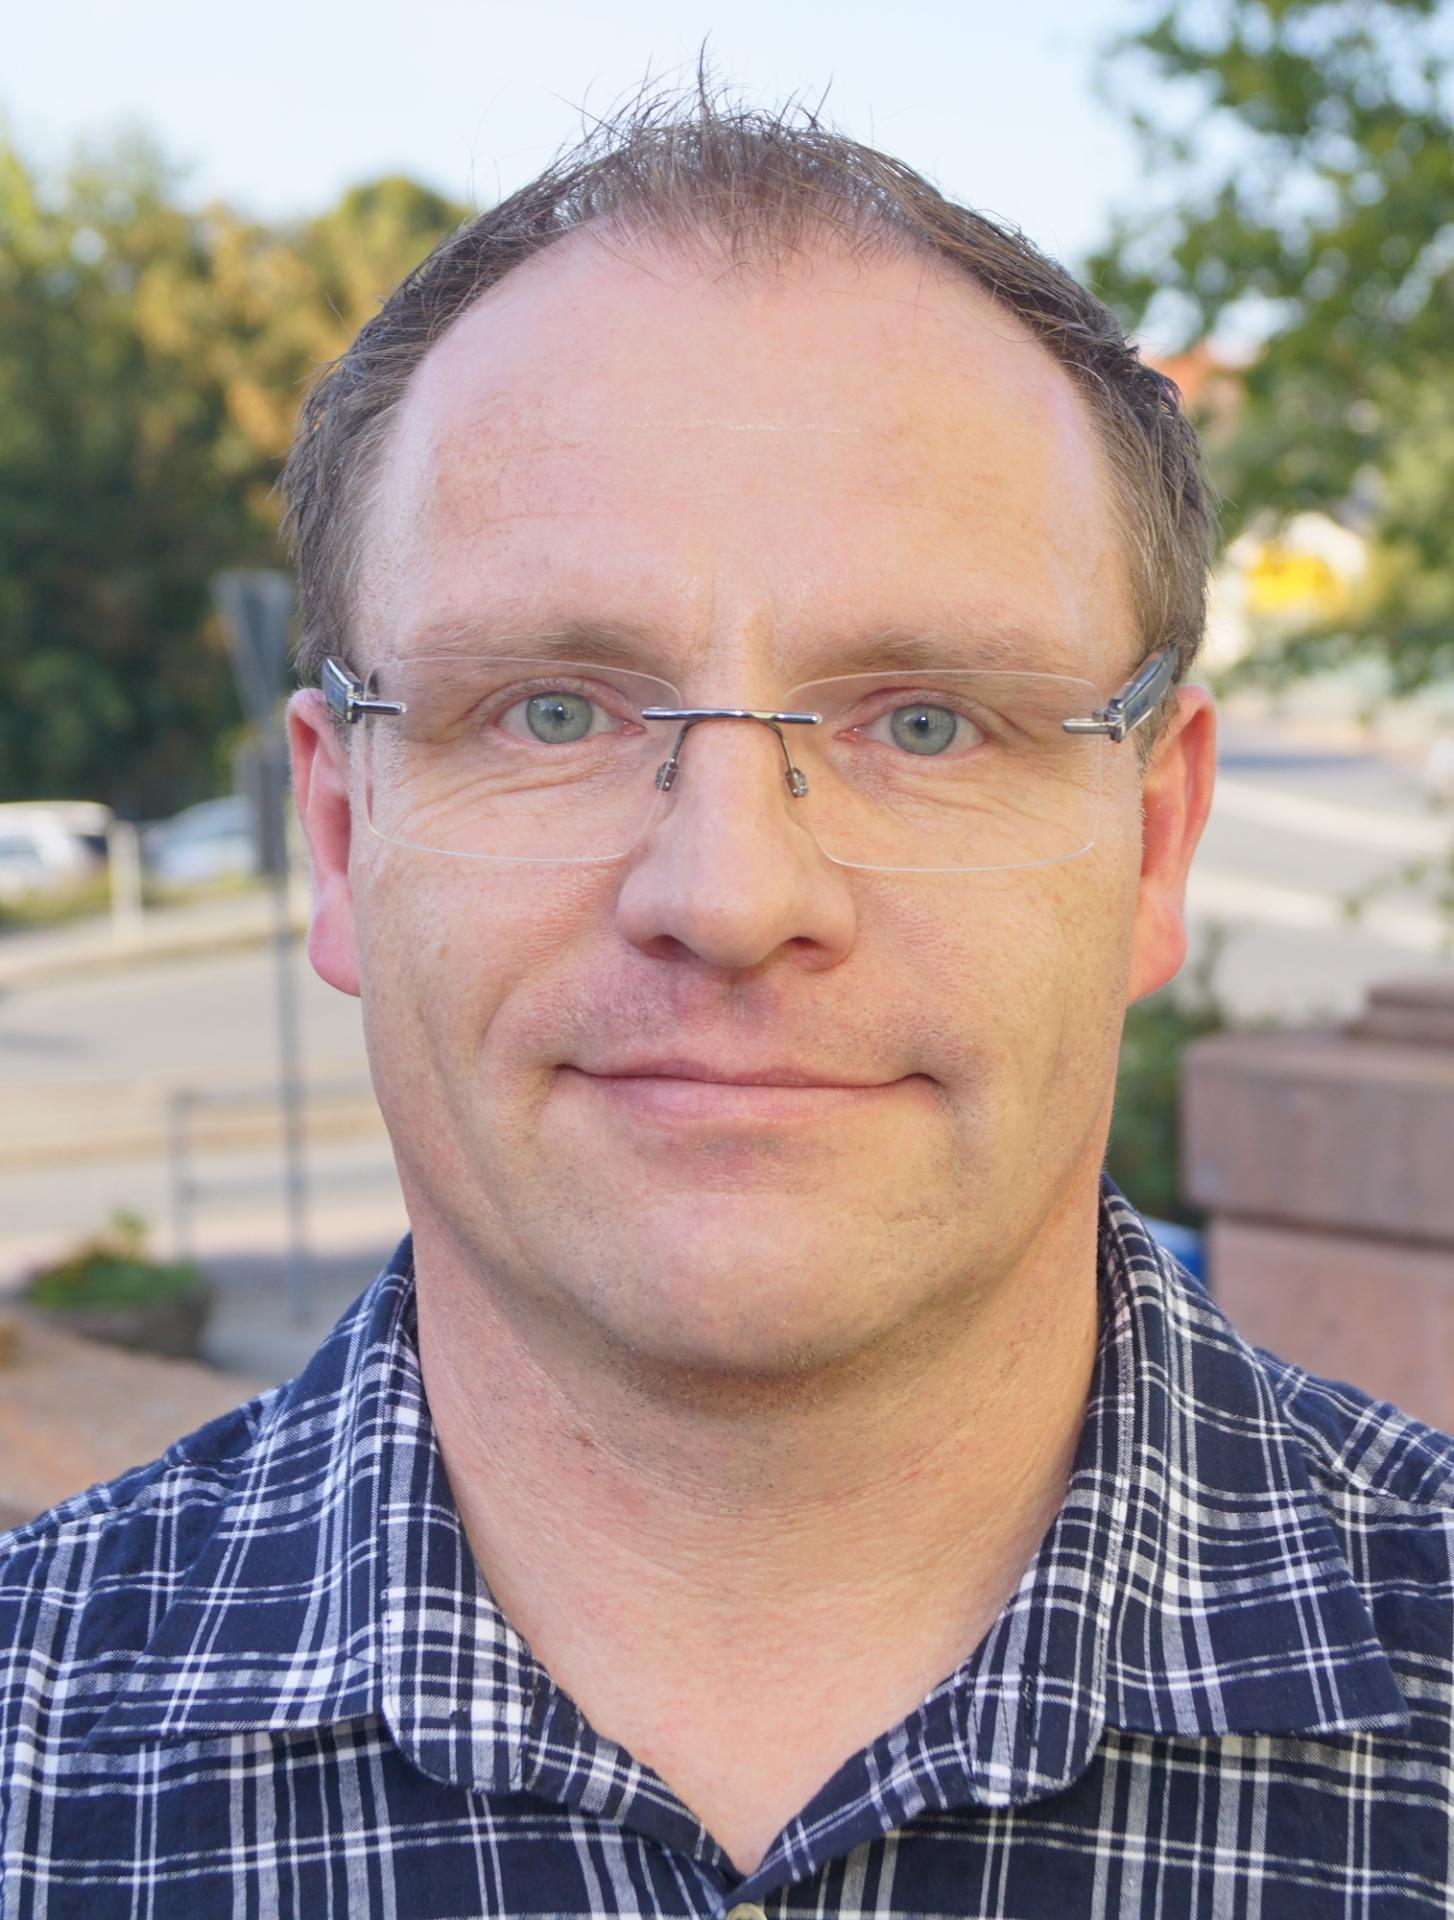 Stadtrat Herr Jan-Olaf Streit